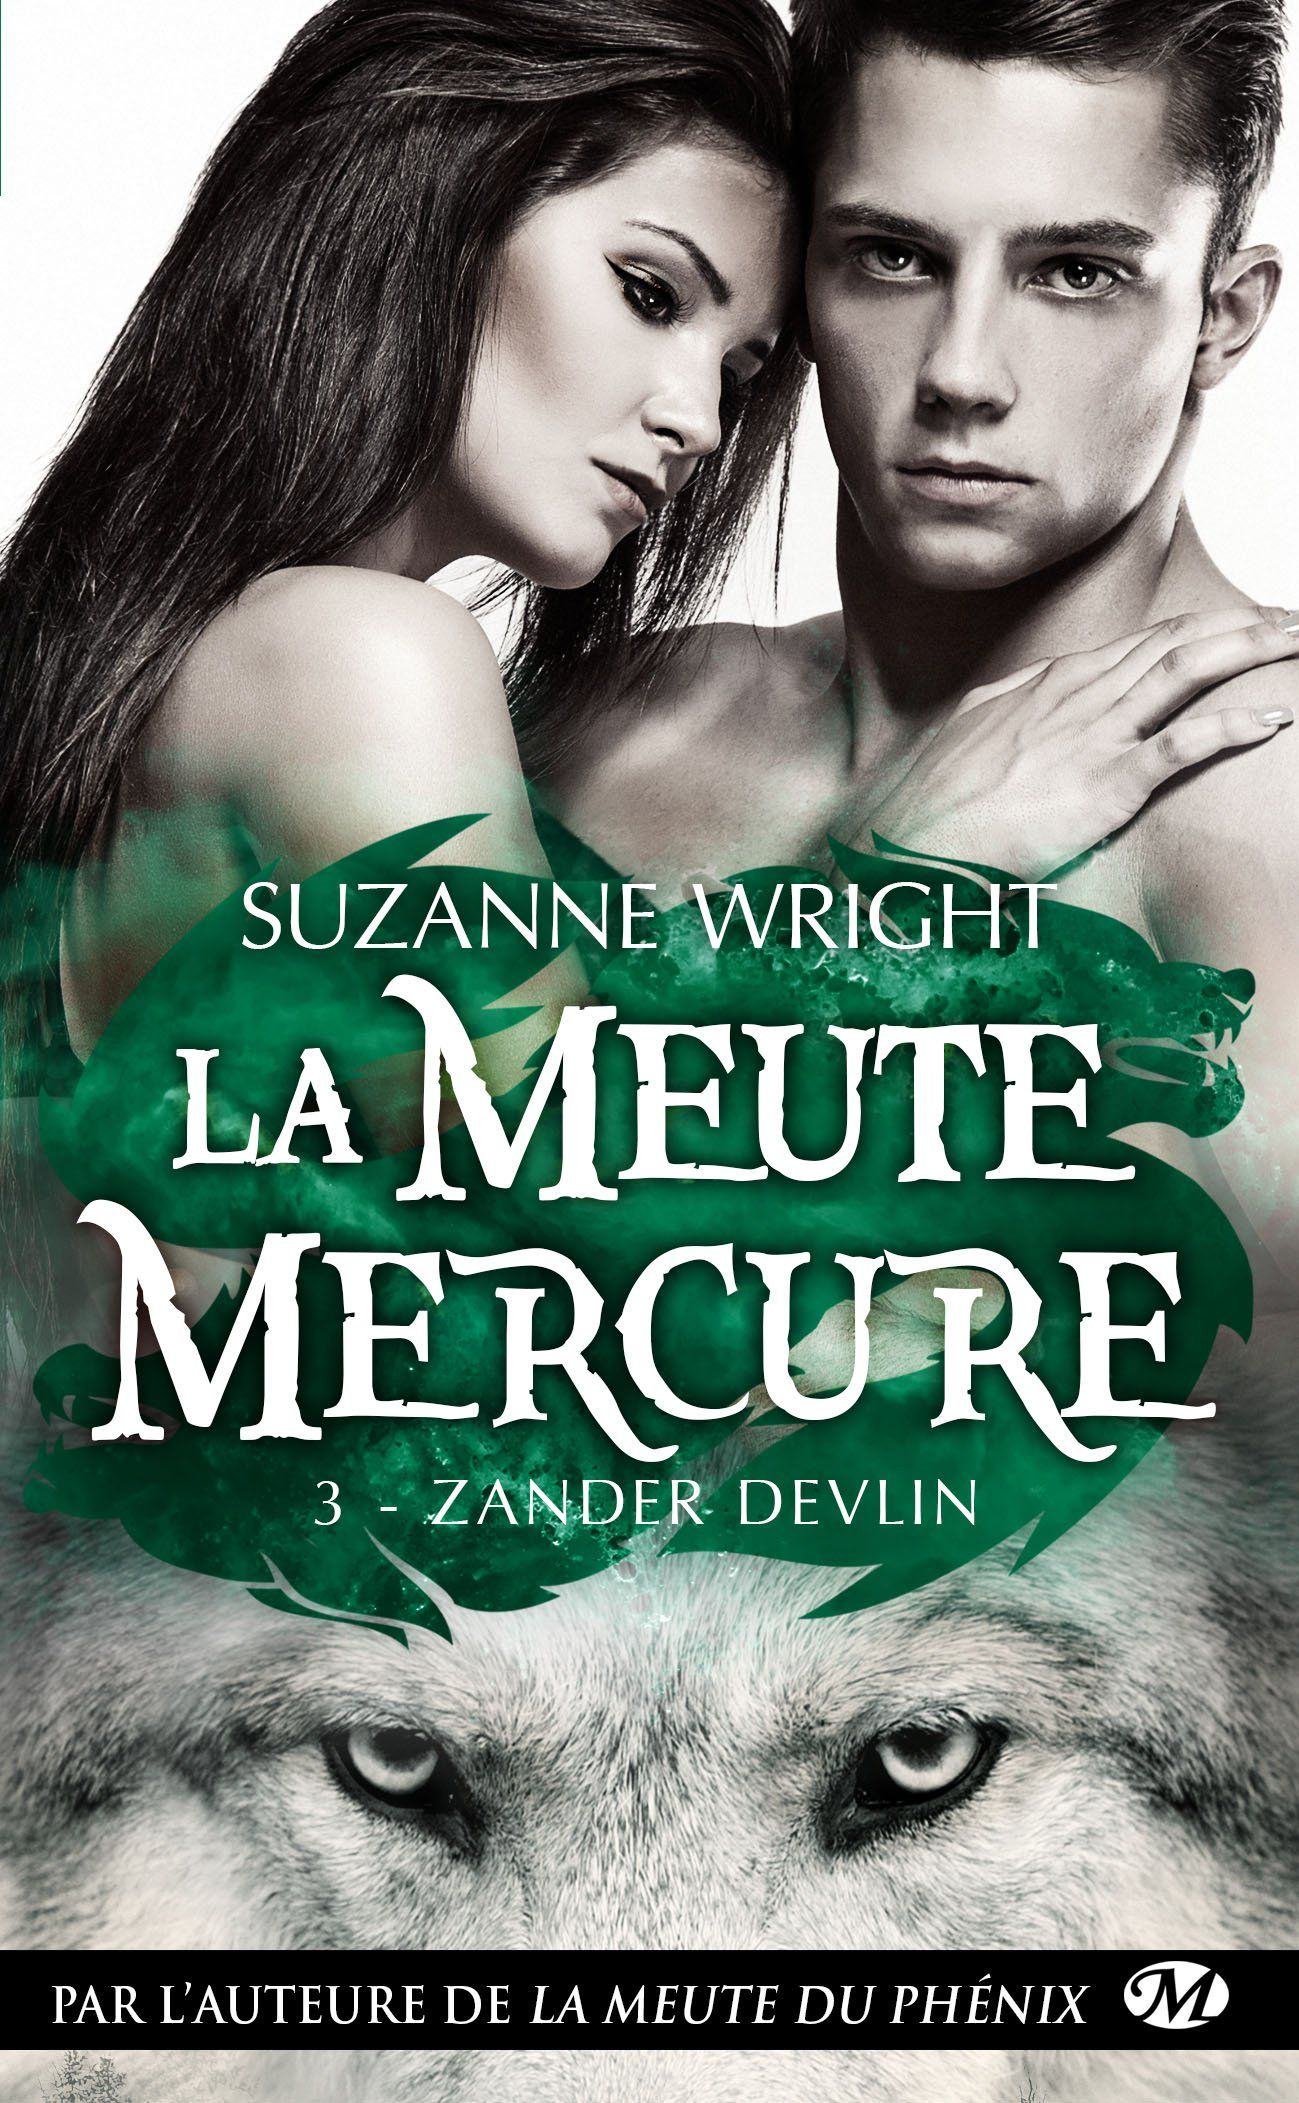 La Meute Du Phénix Tome 2 Pdf : meute, phénix, Gratuit, Meute, Mercure, Zander, Devlin, Suzanne, Wright, Ebook,, Books, Online,